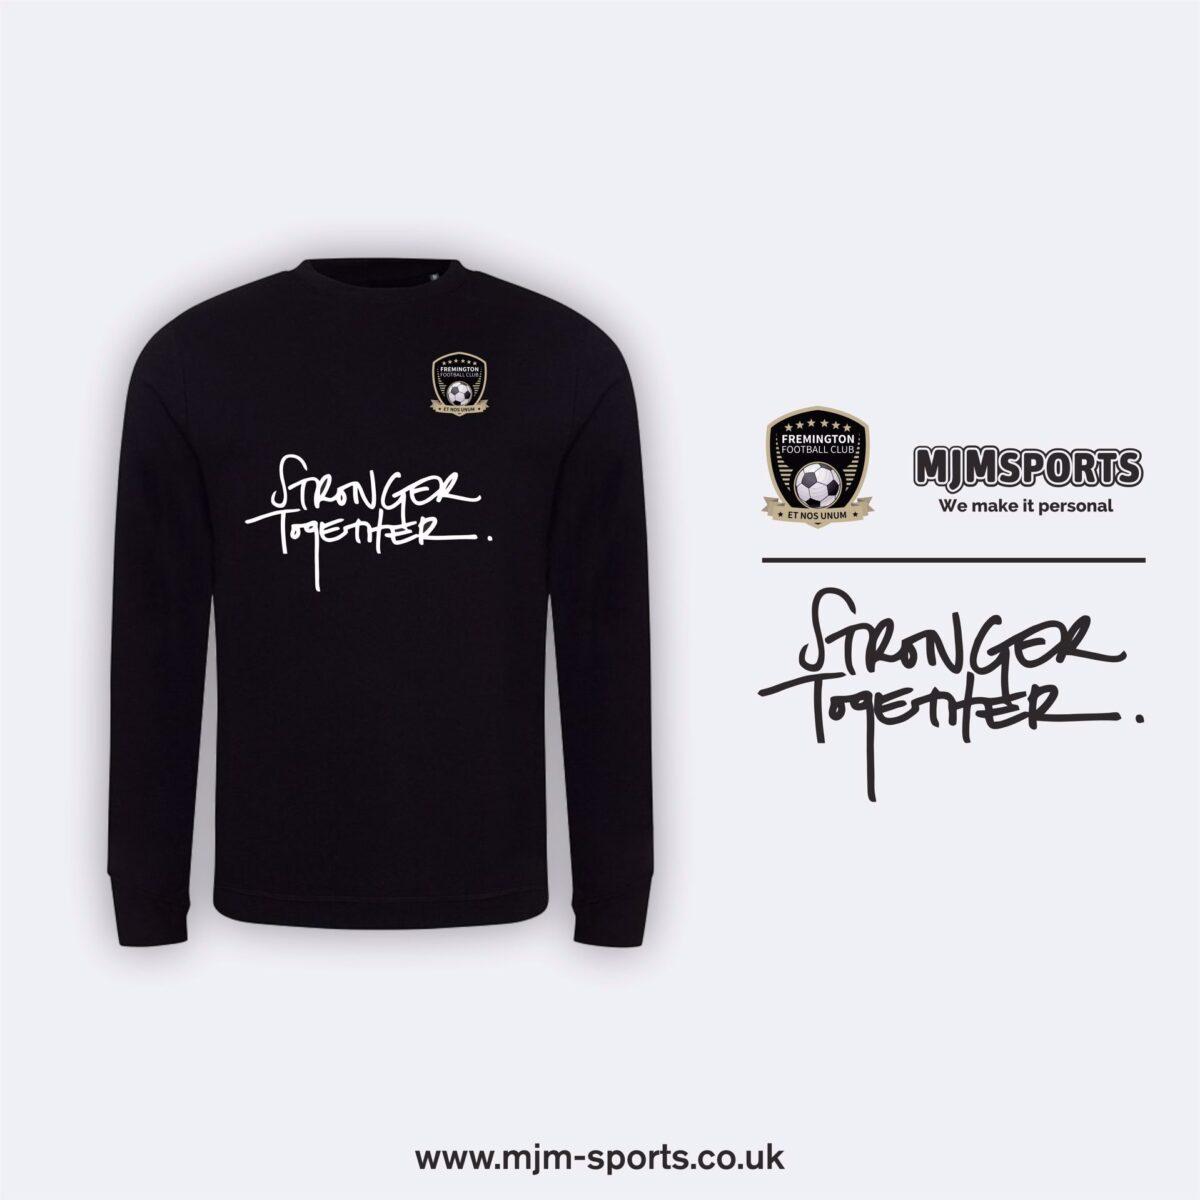 Fremington FC Stronger Together  Sweatshirt Adult